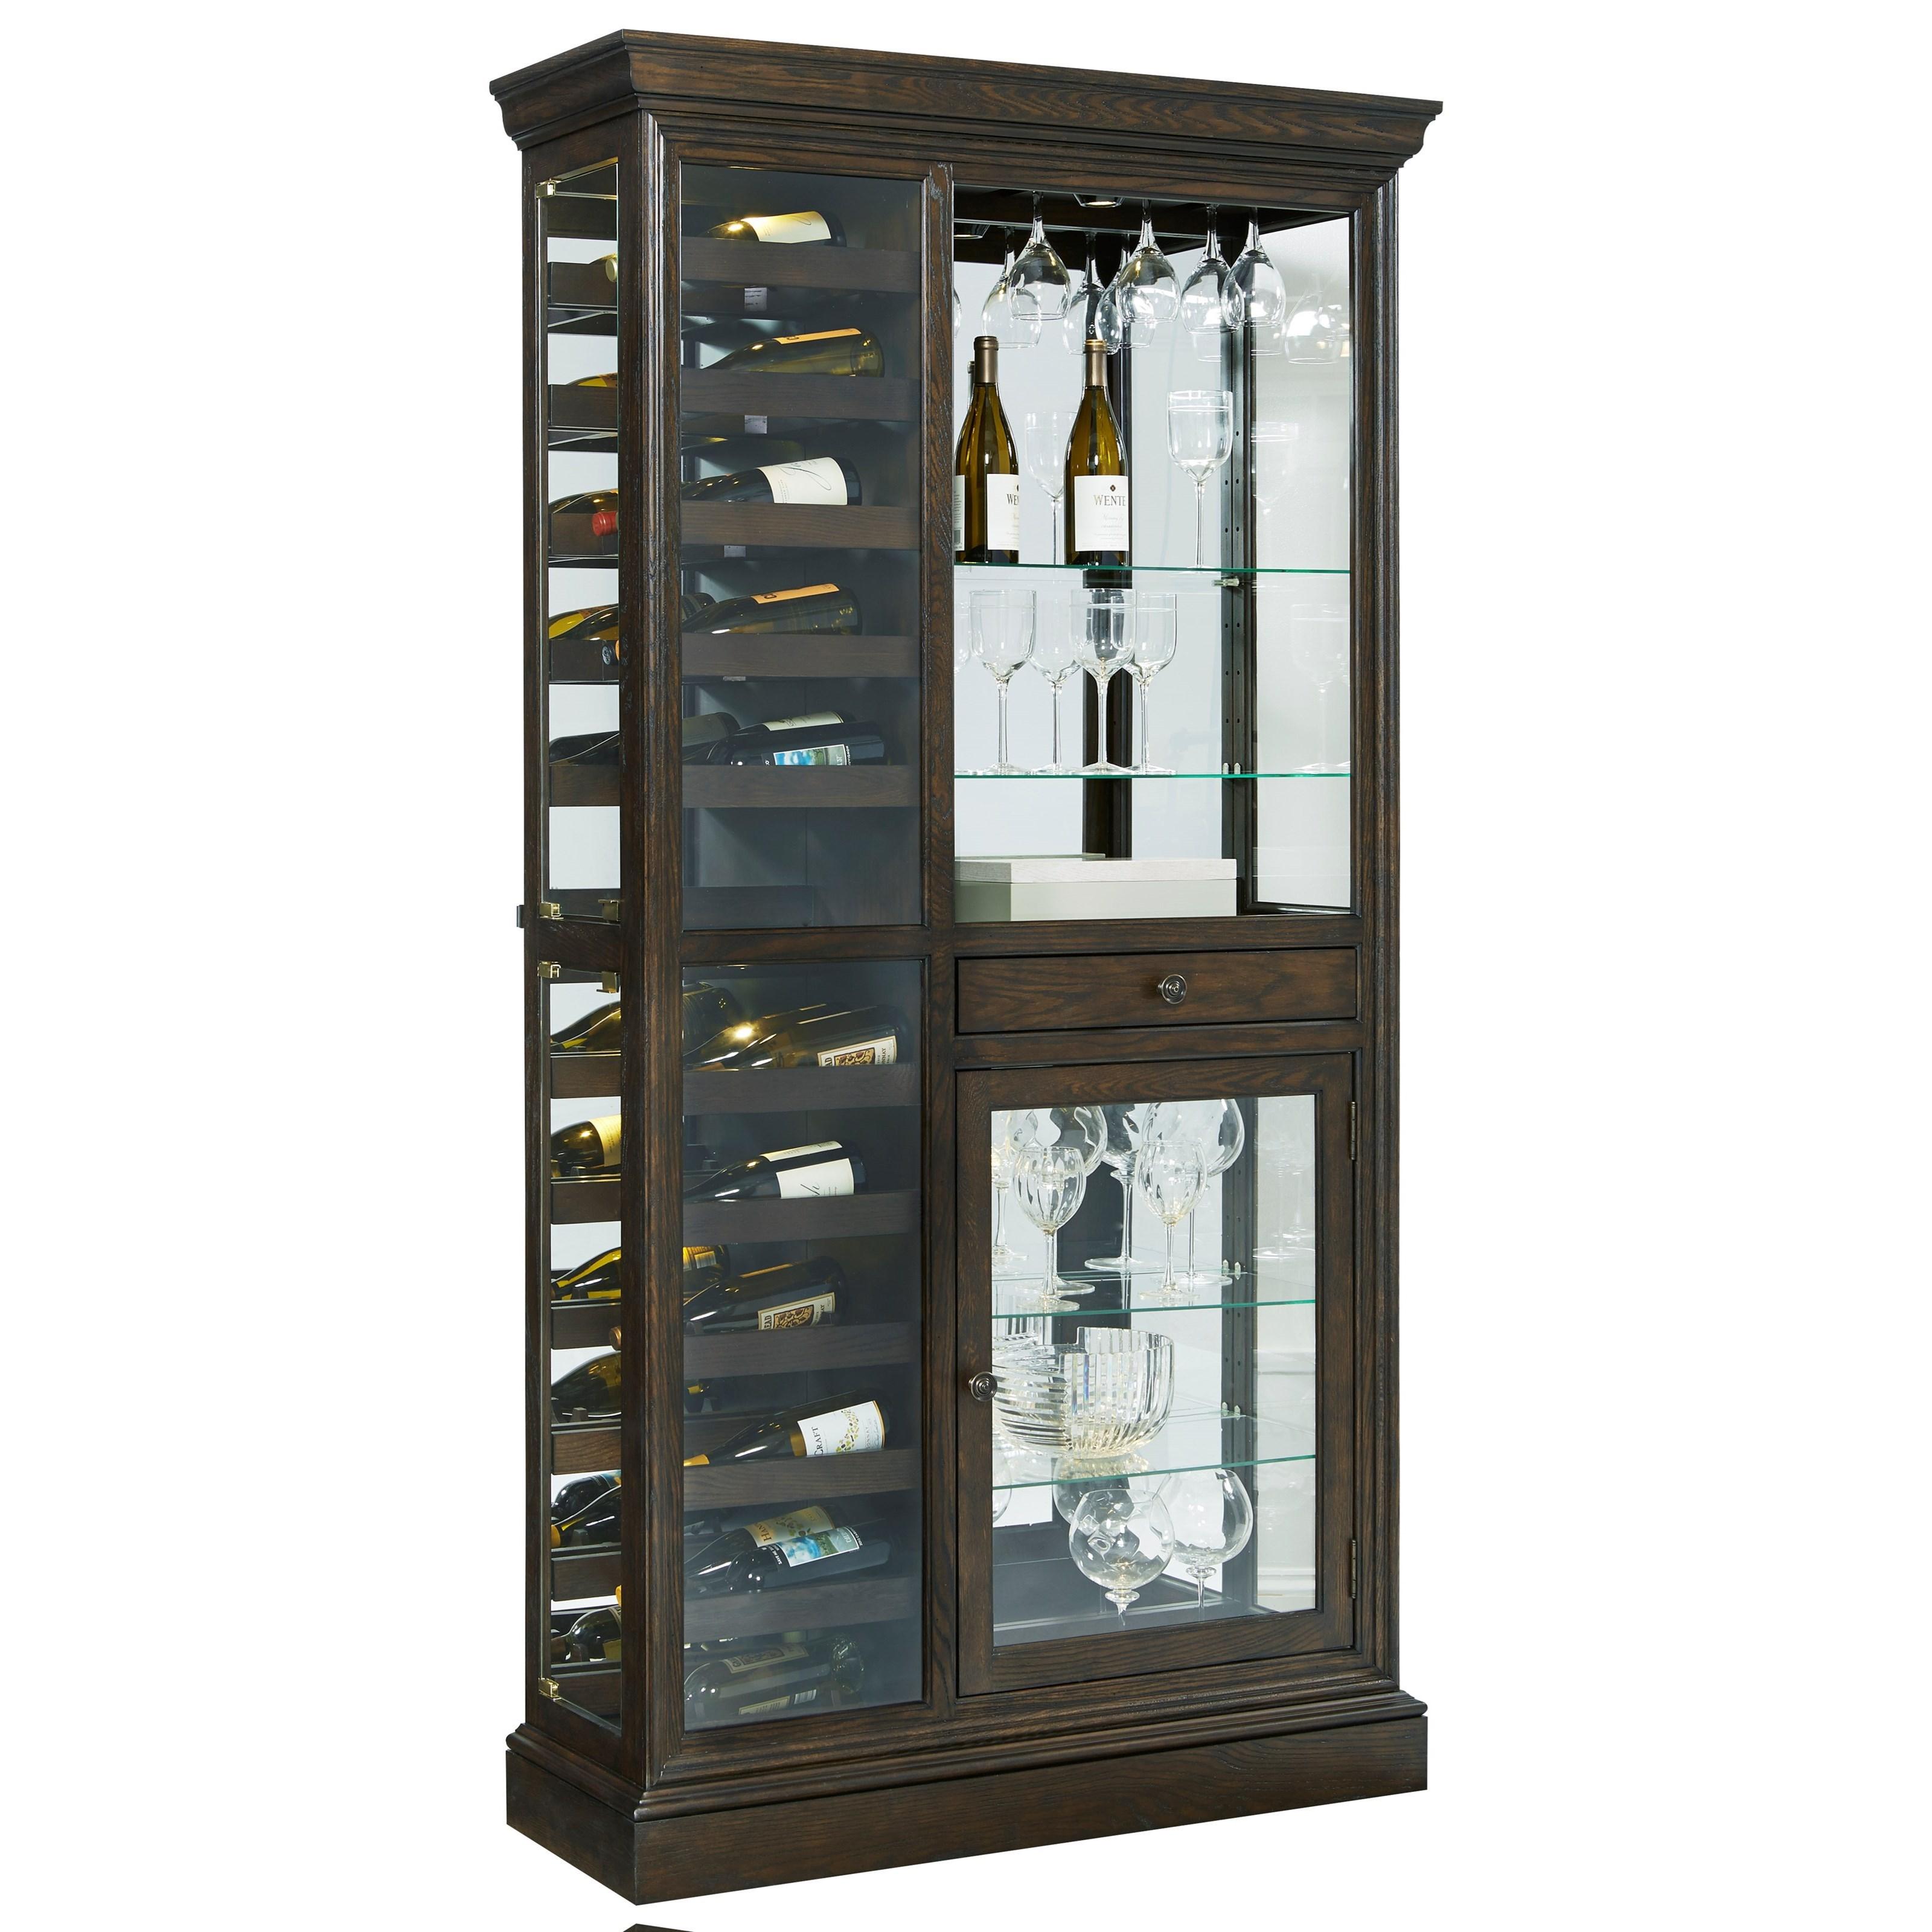 Pulaski Furniture Curios Wine Curio With Touch LED Lighting   Hudsonu0027s  Furniture   Curio Cabinets